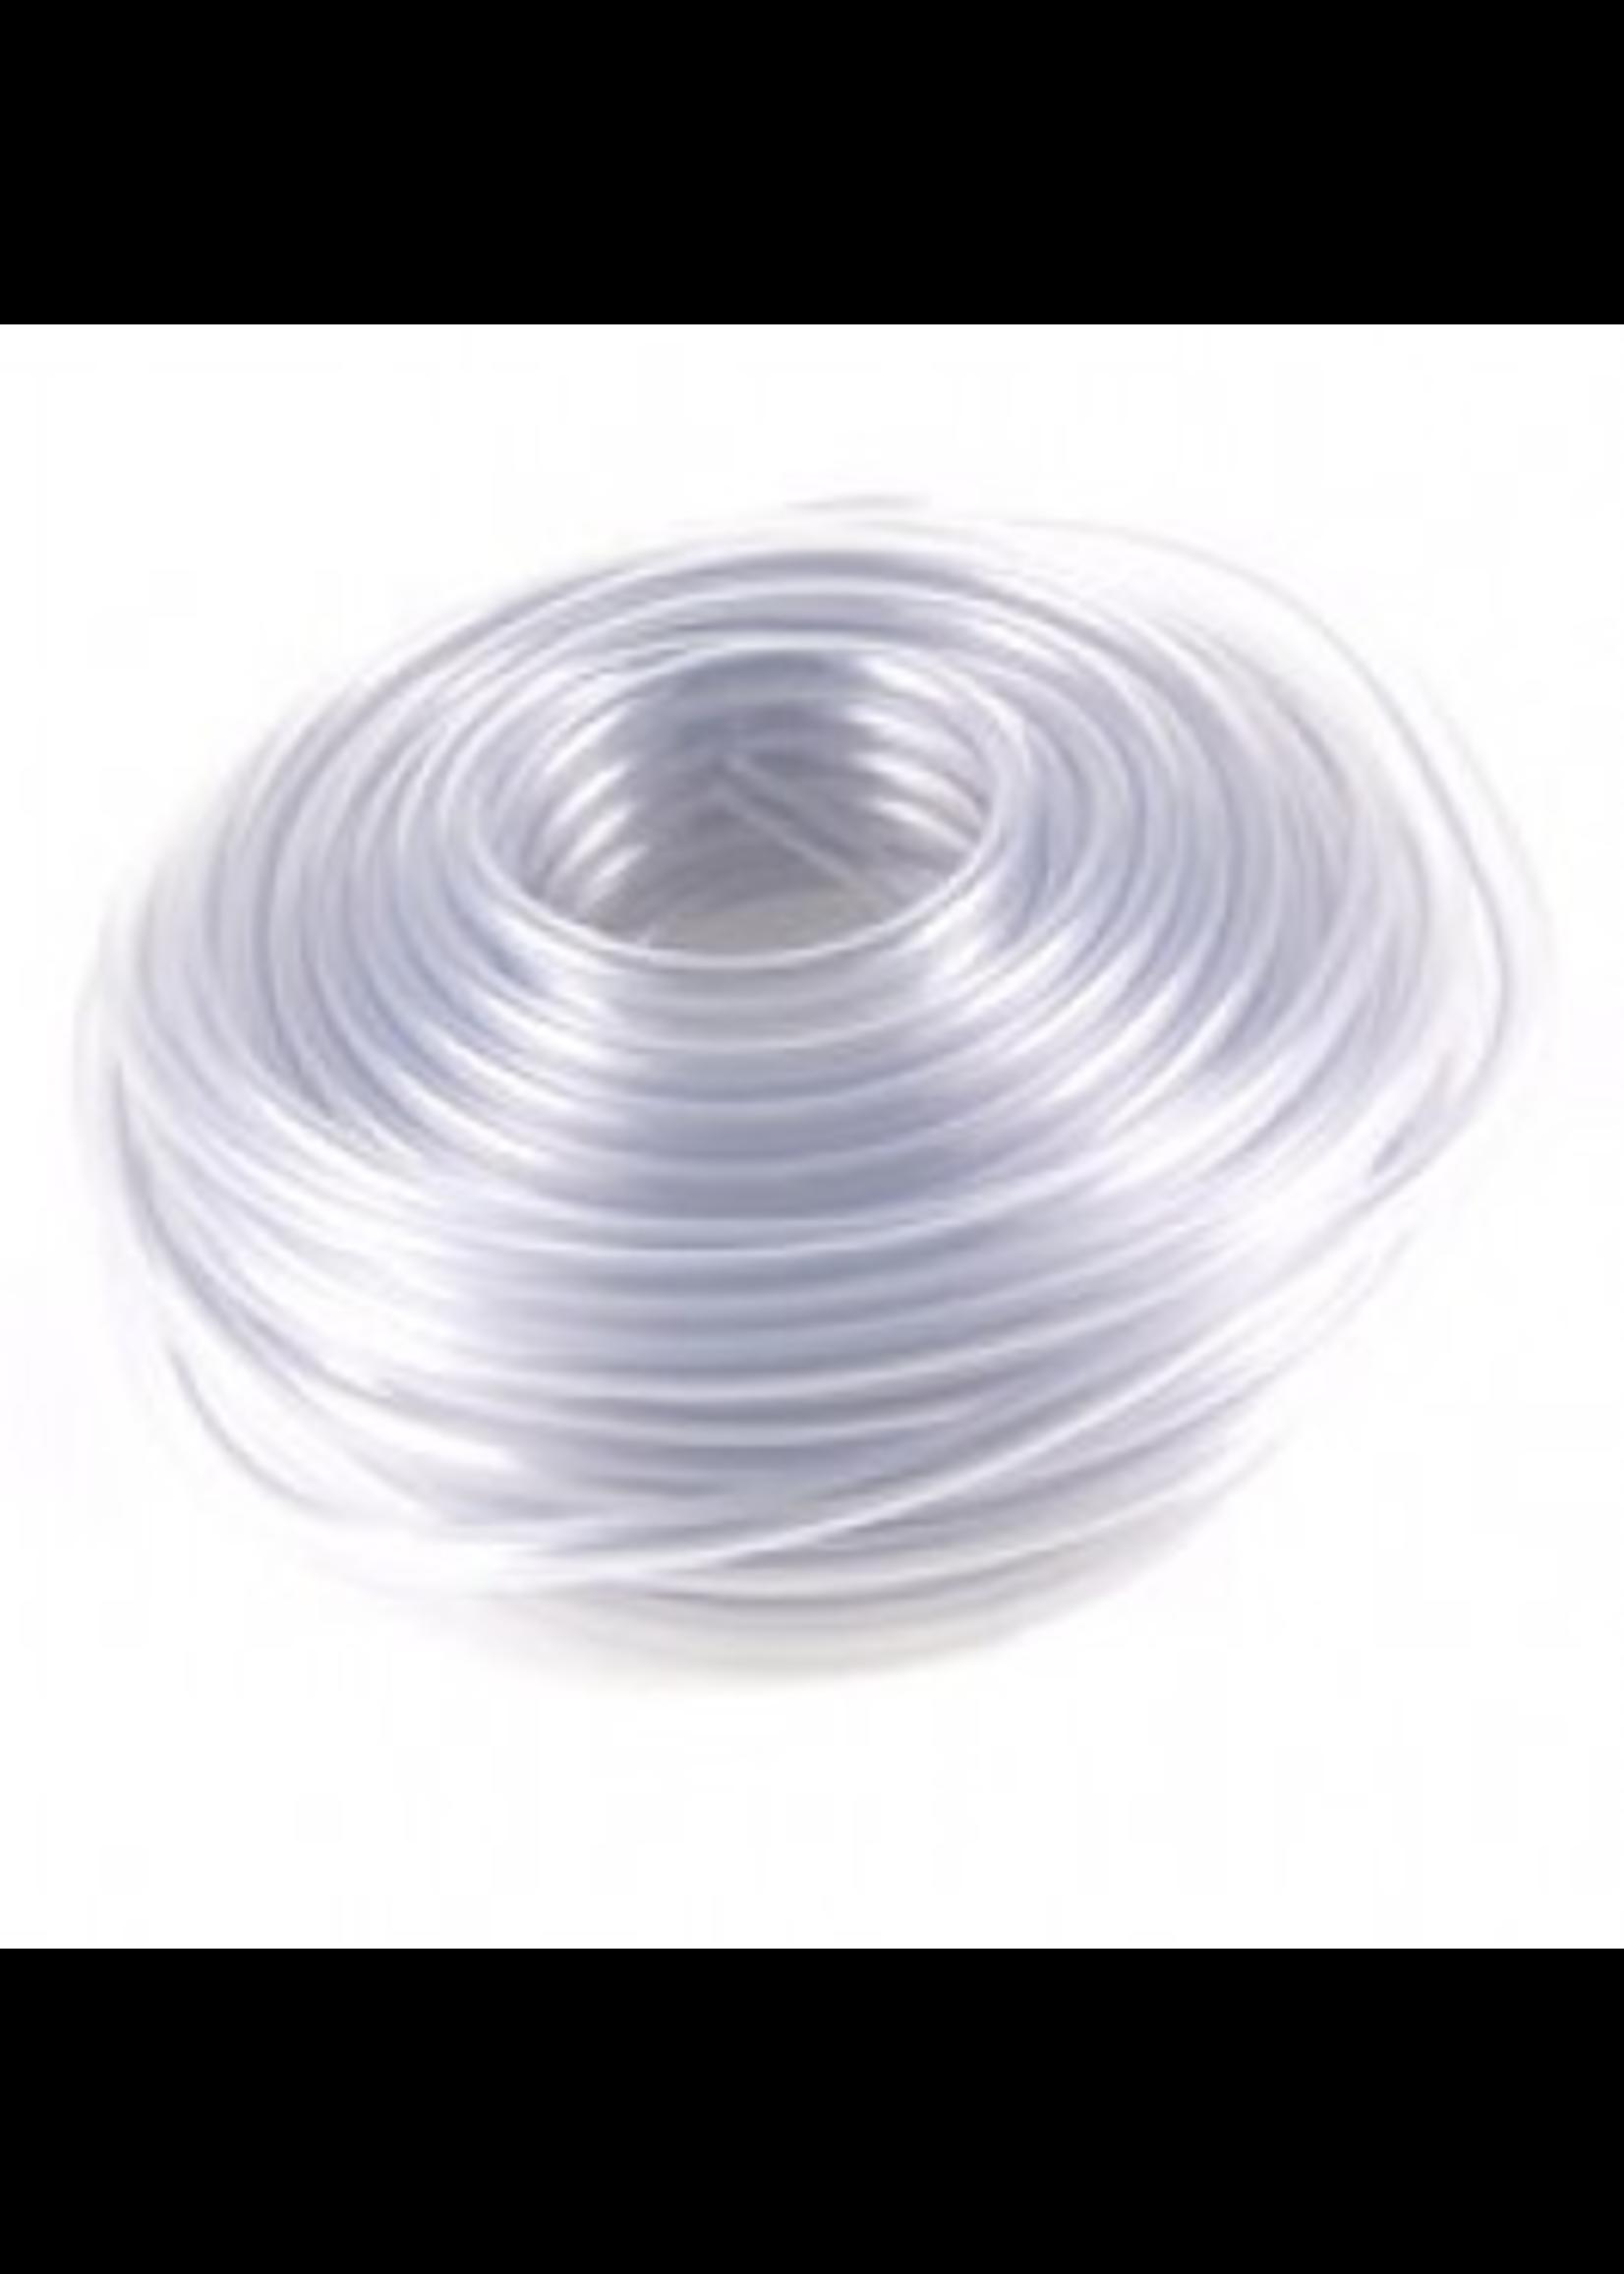 "Tubing Siphon Hose - 7/16"" ID Tubing - 1' Length"